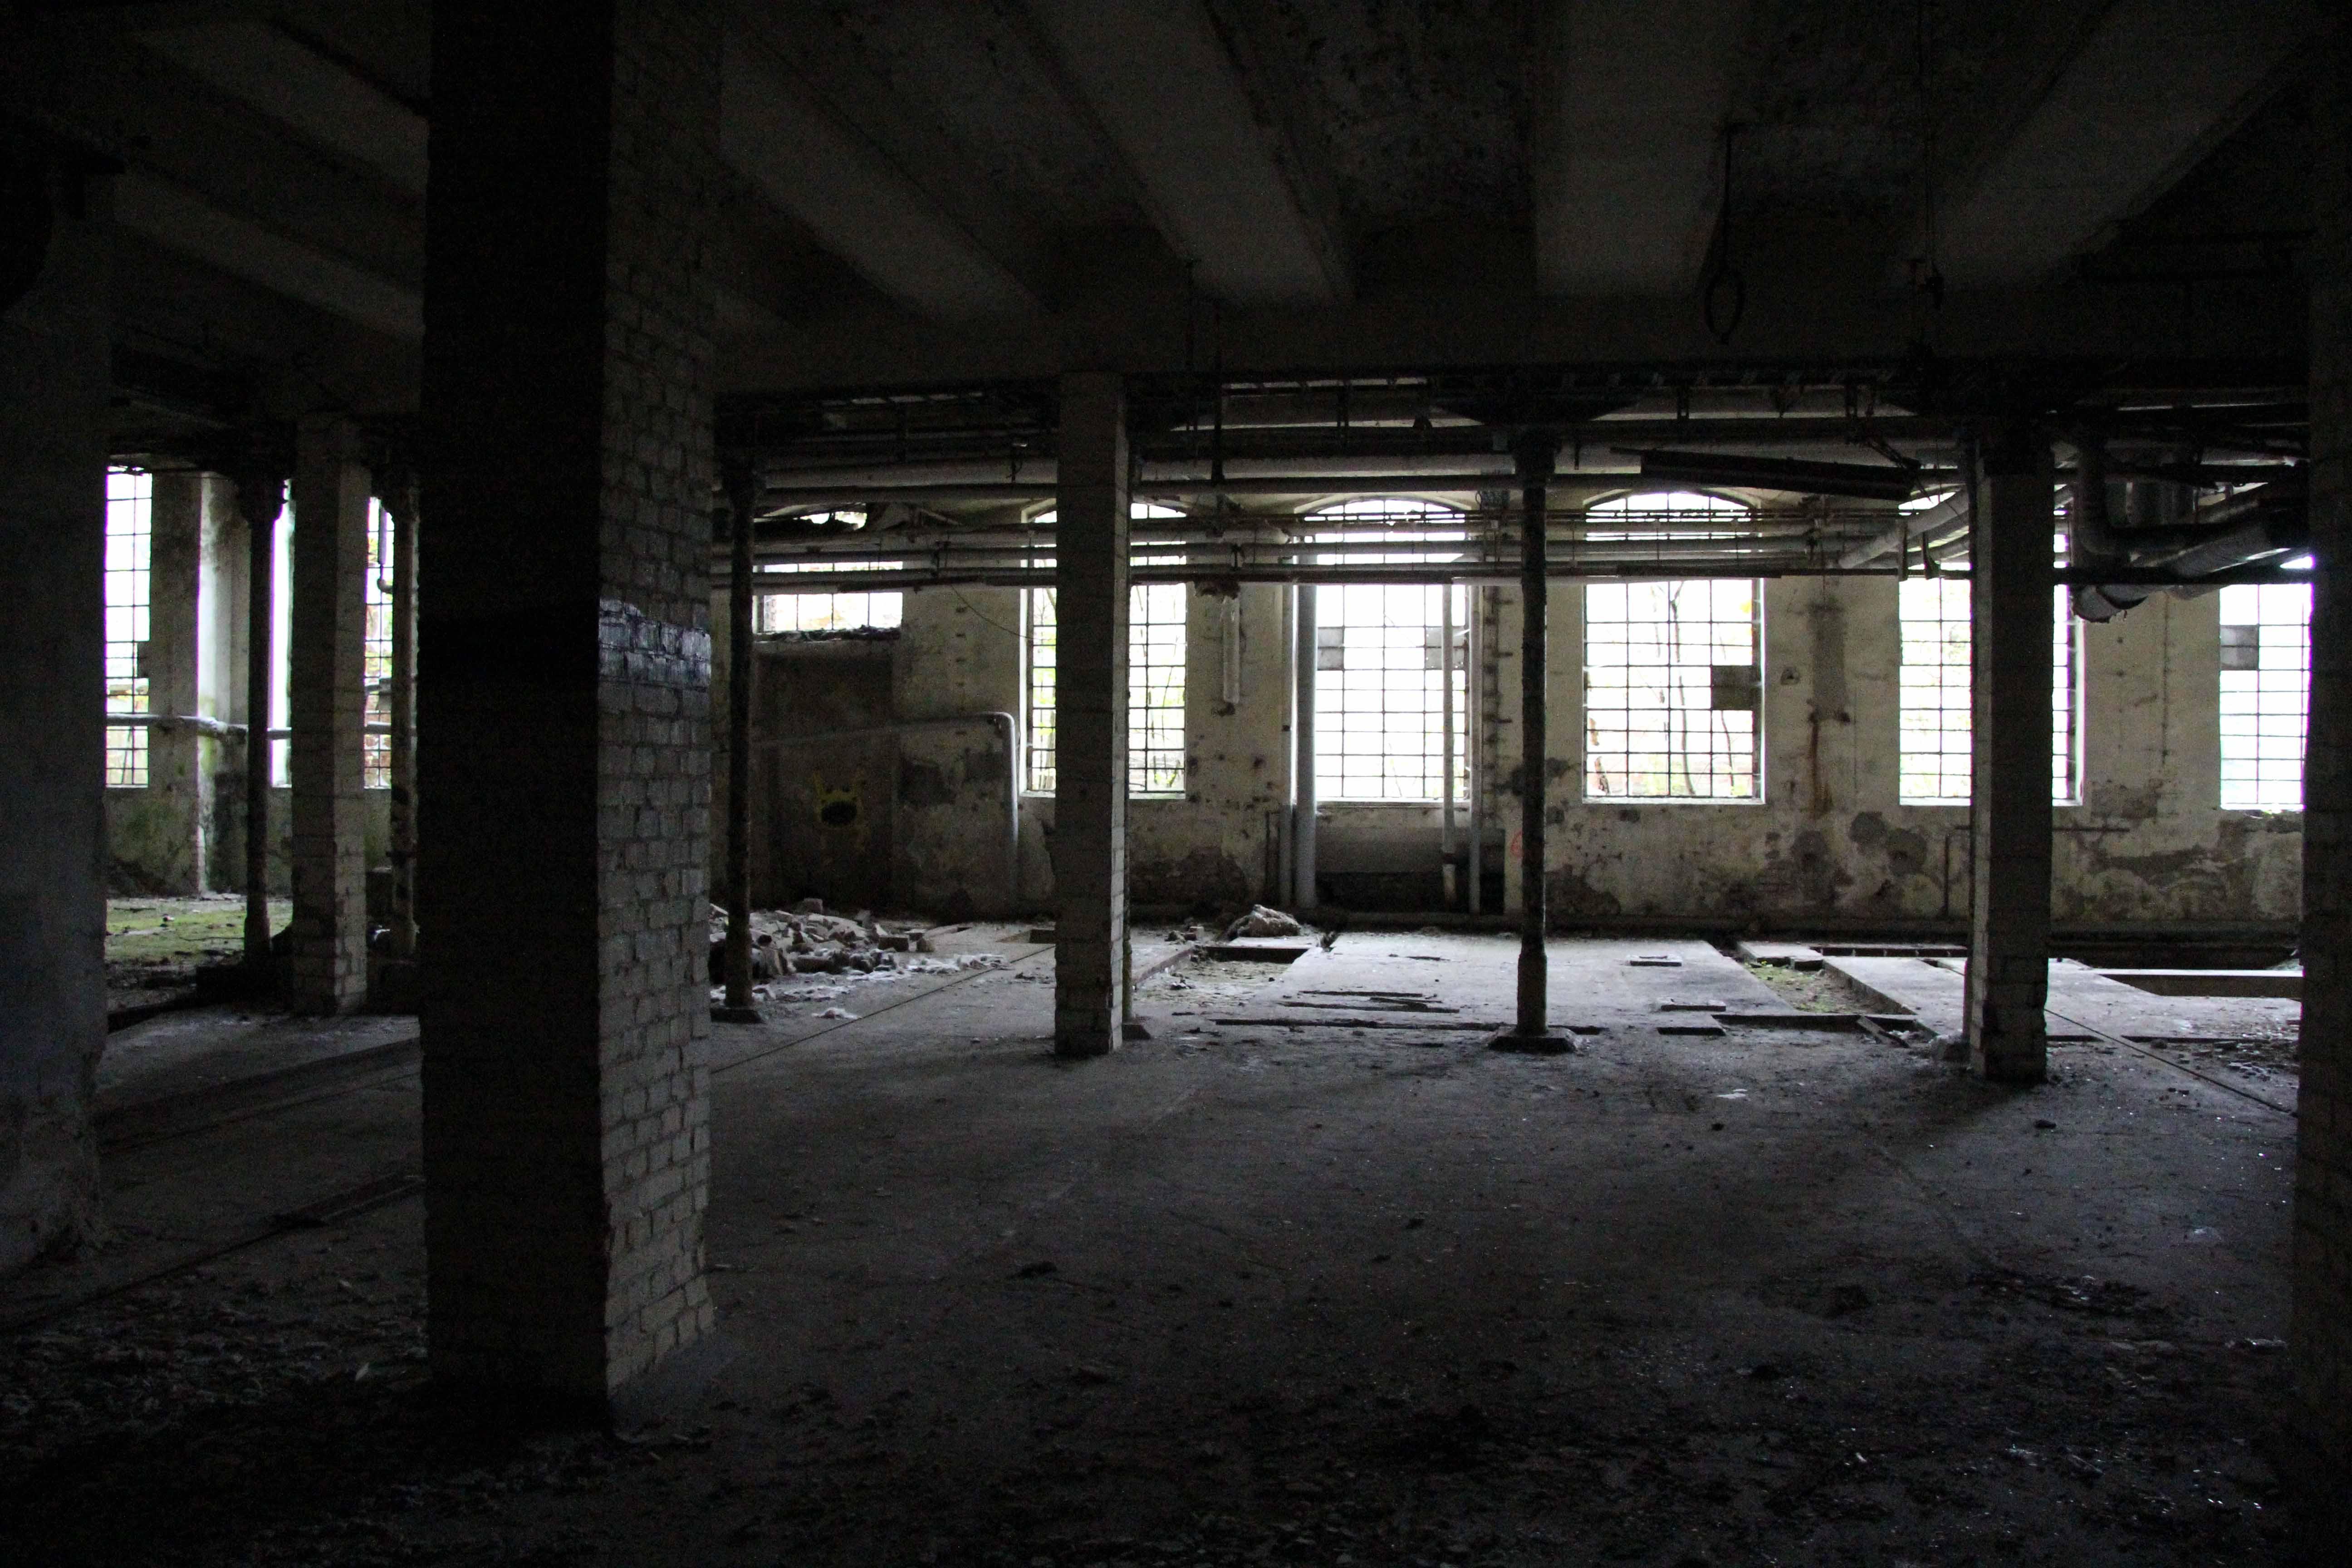 Pillars and Windows at Papierfabrik Wolfswinkel, an abandoned paper mill near Berlin